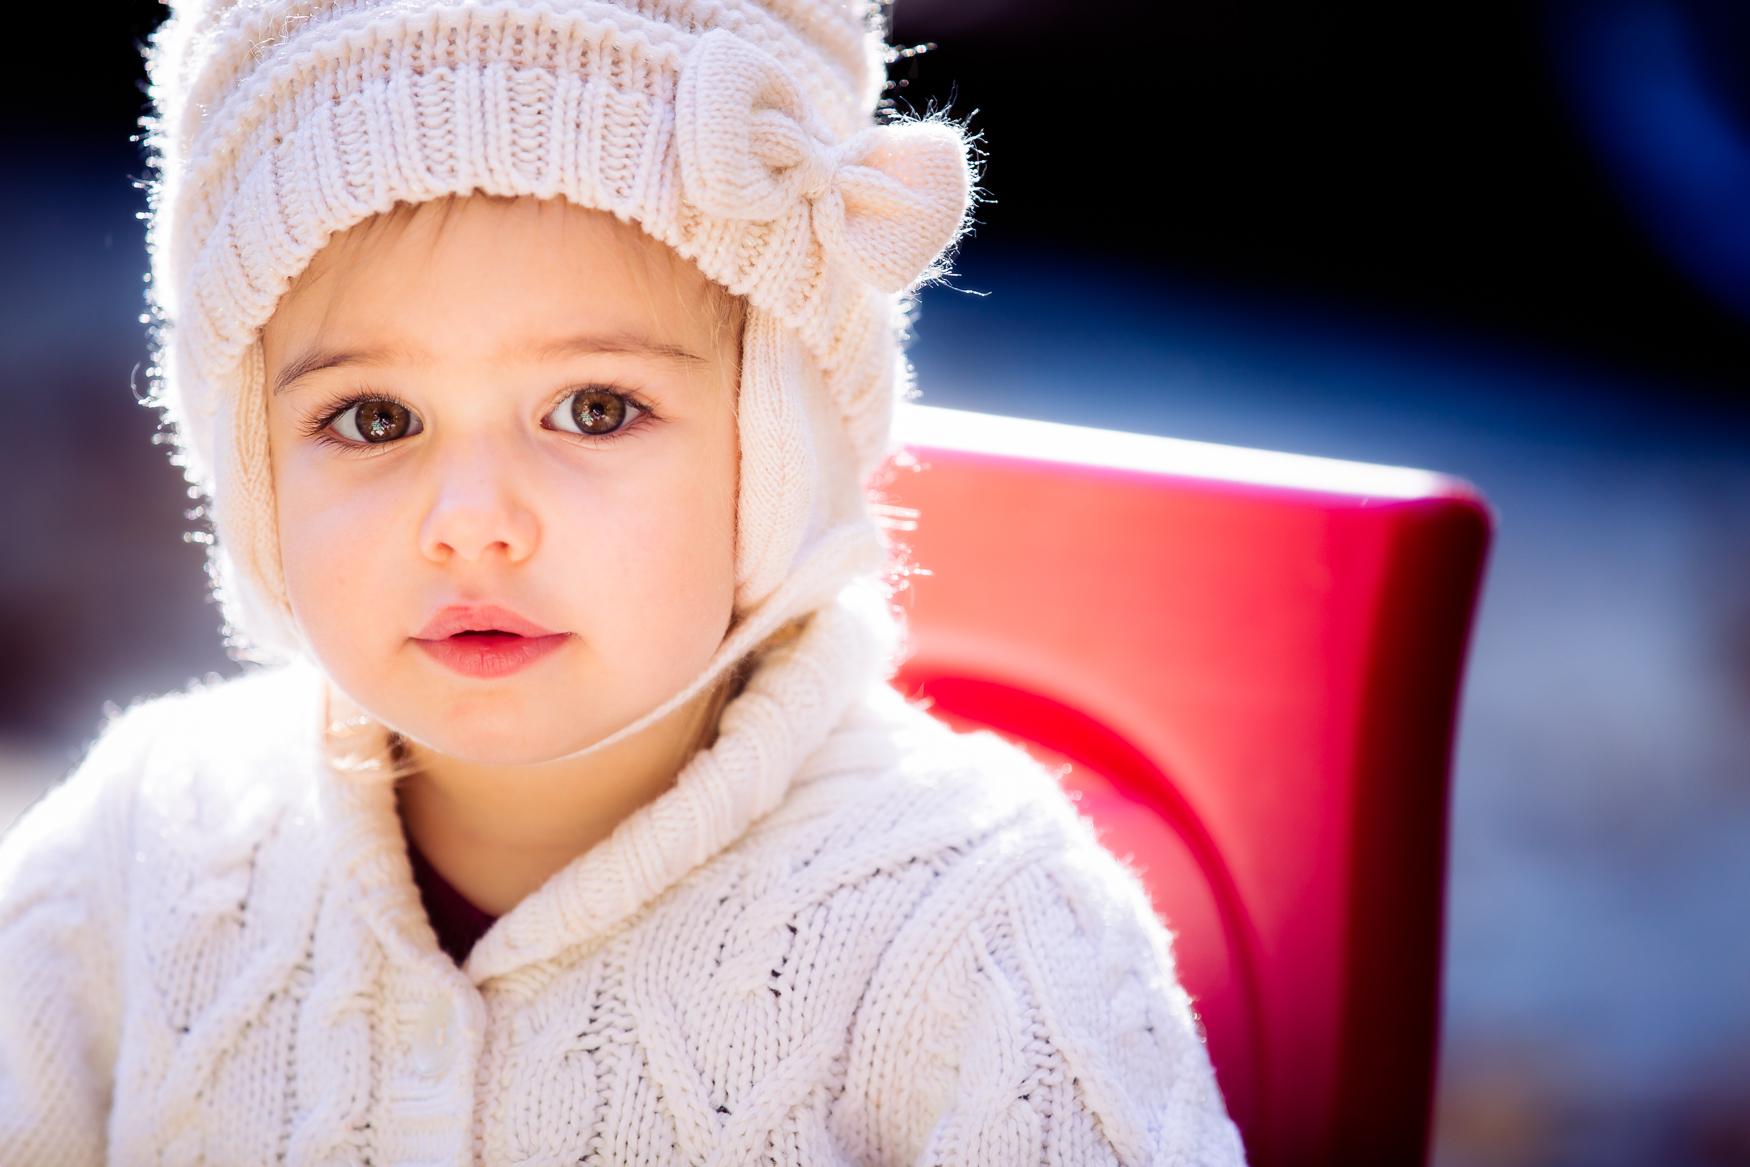 KidsPortraitPhotography-1.jpg